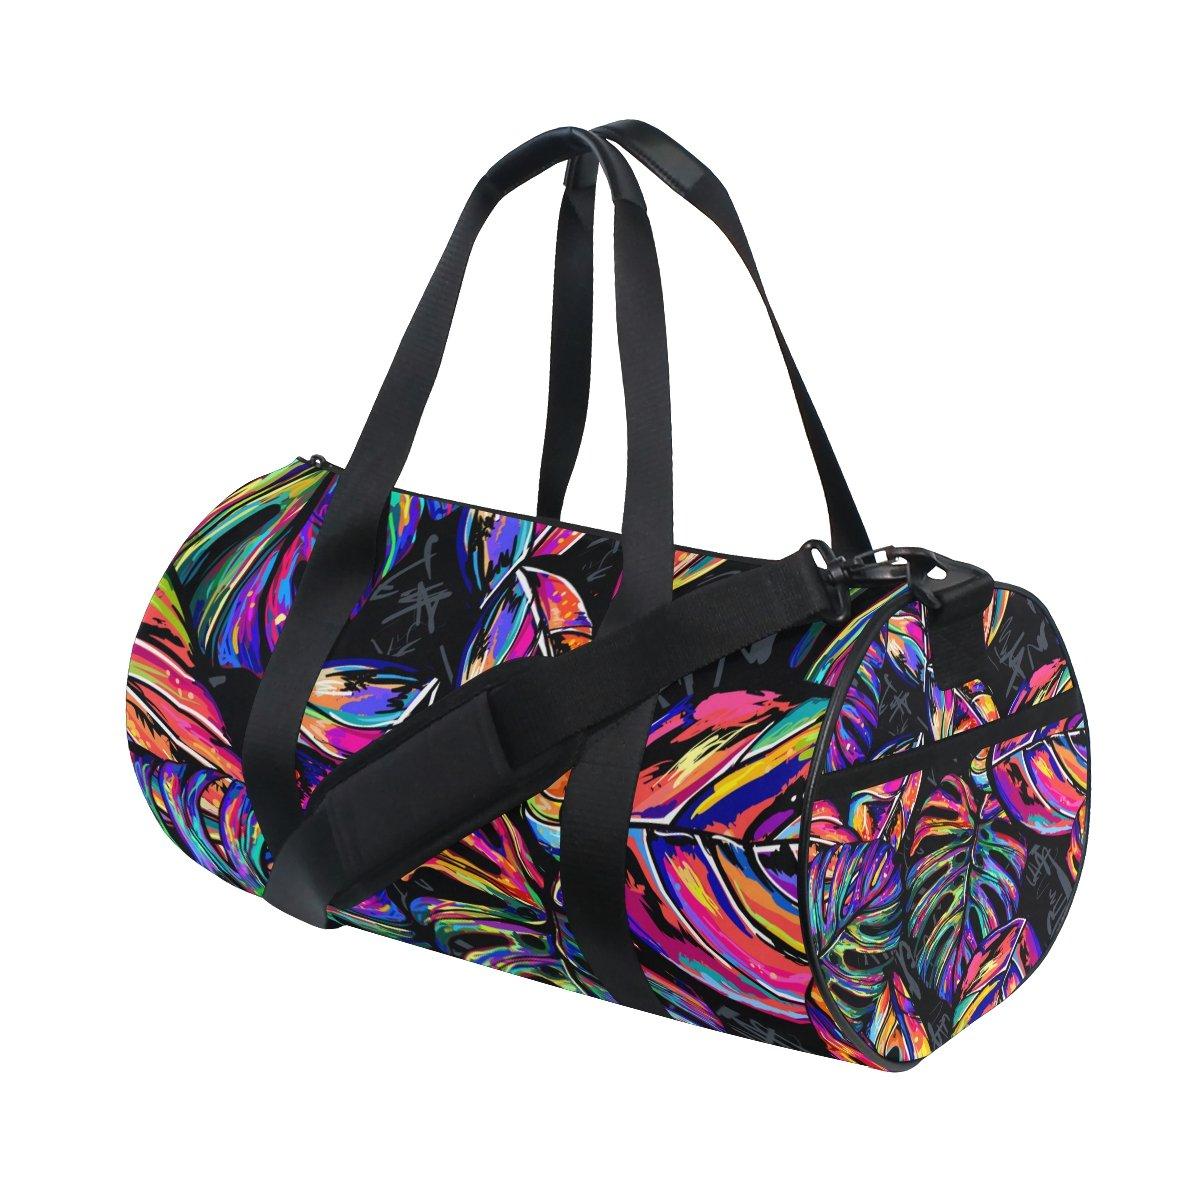 U LIFE Summer Tropical Palm Trees Colorful Hippie Sports Gym Shoulder Handy Duffel Bags for Women Men Kids Boys Girls